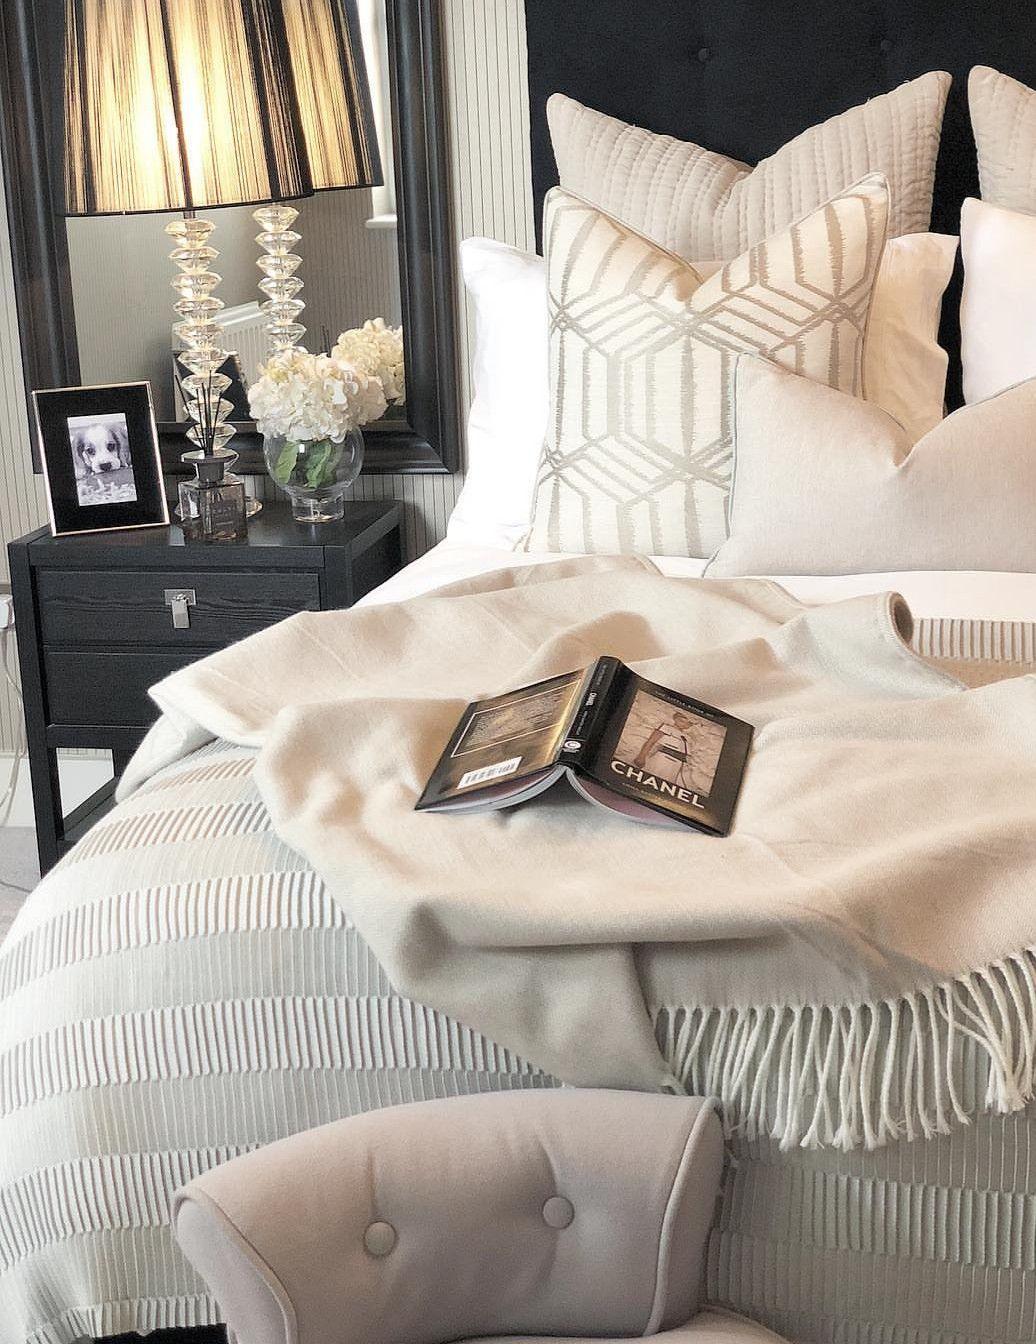 Pin By On Quarto Home Bedroom Elegant Home Decor Elegant Bedroom